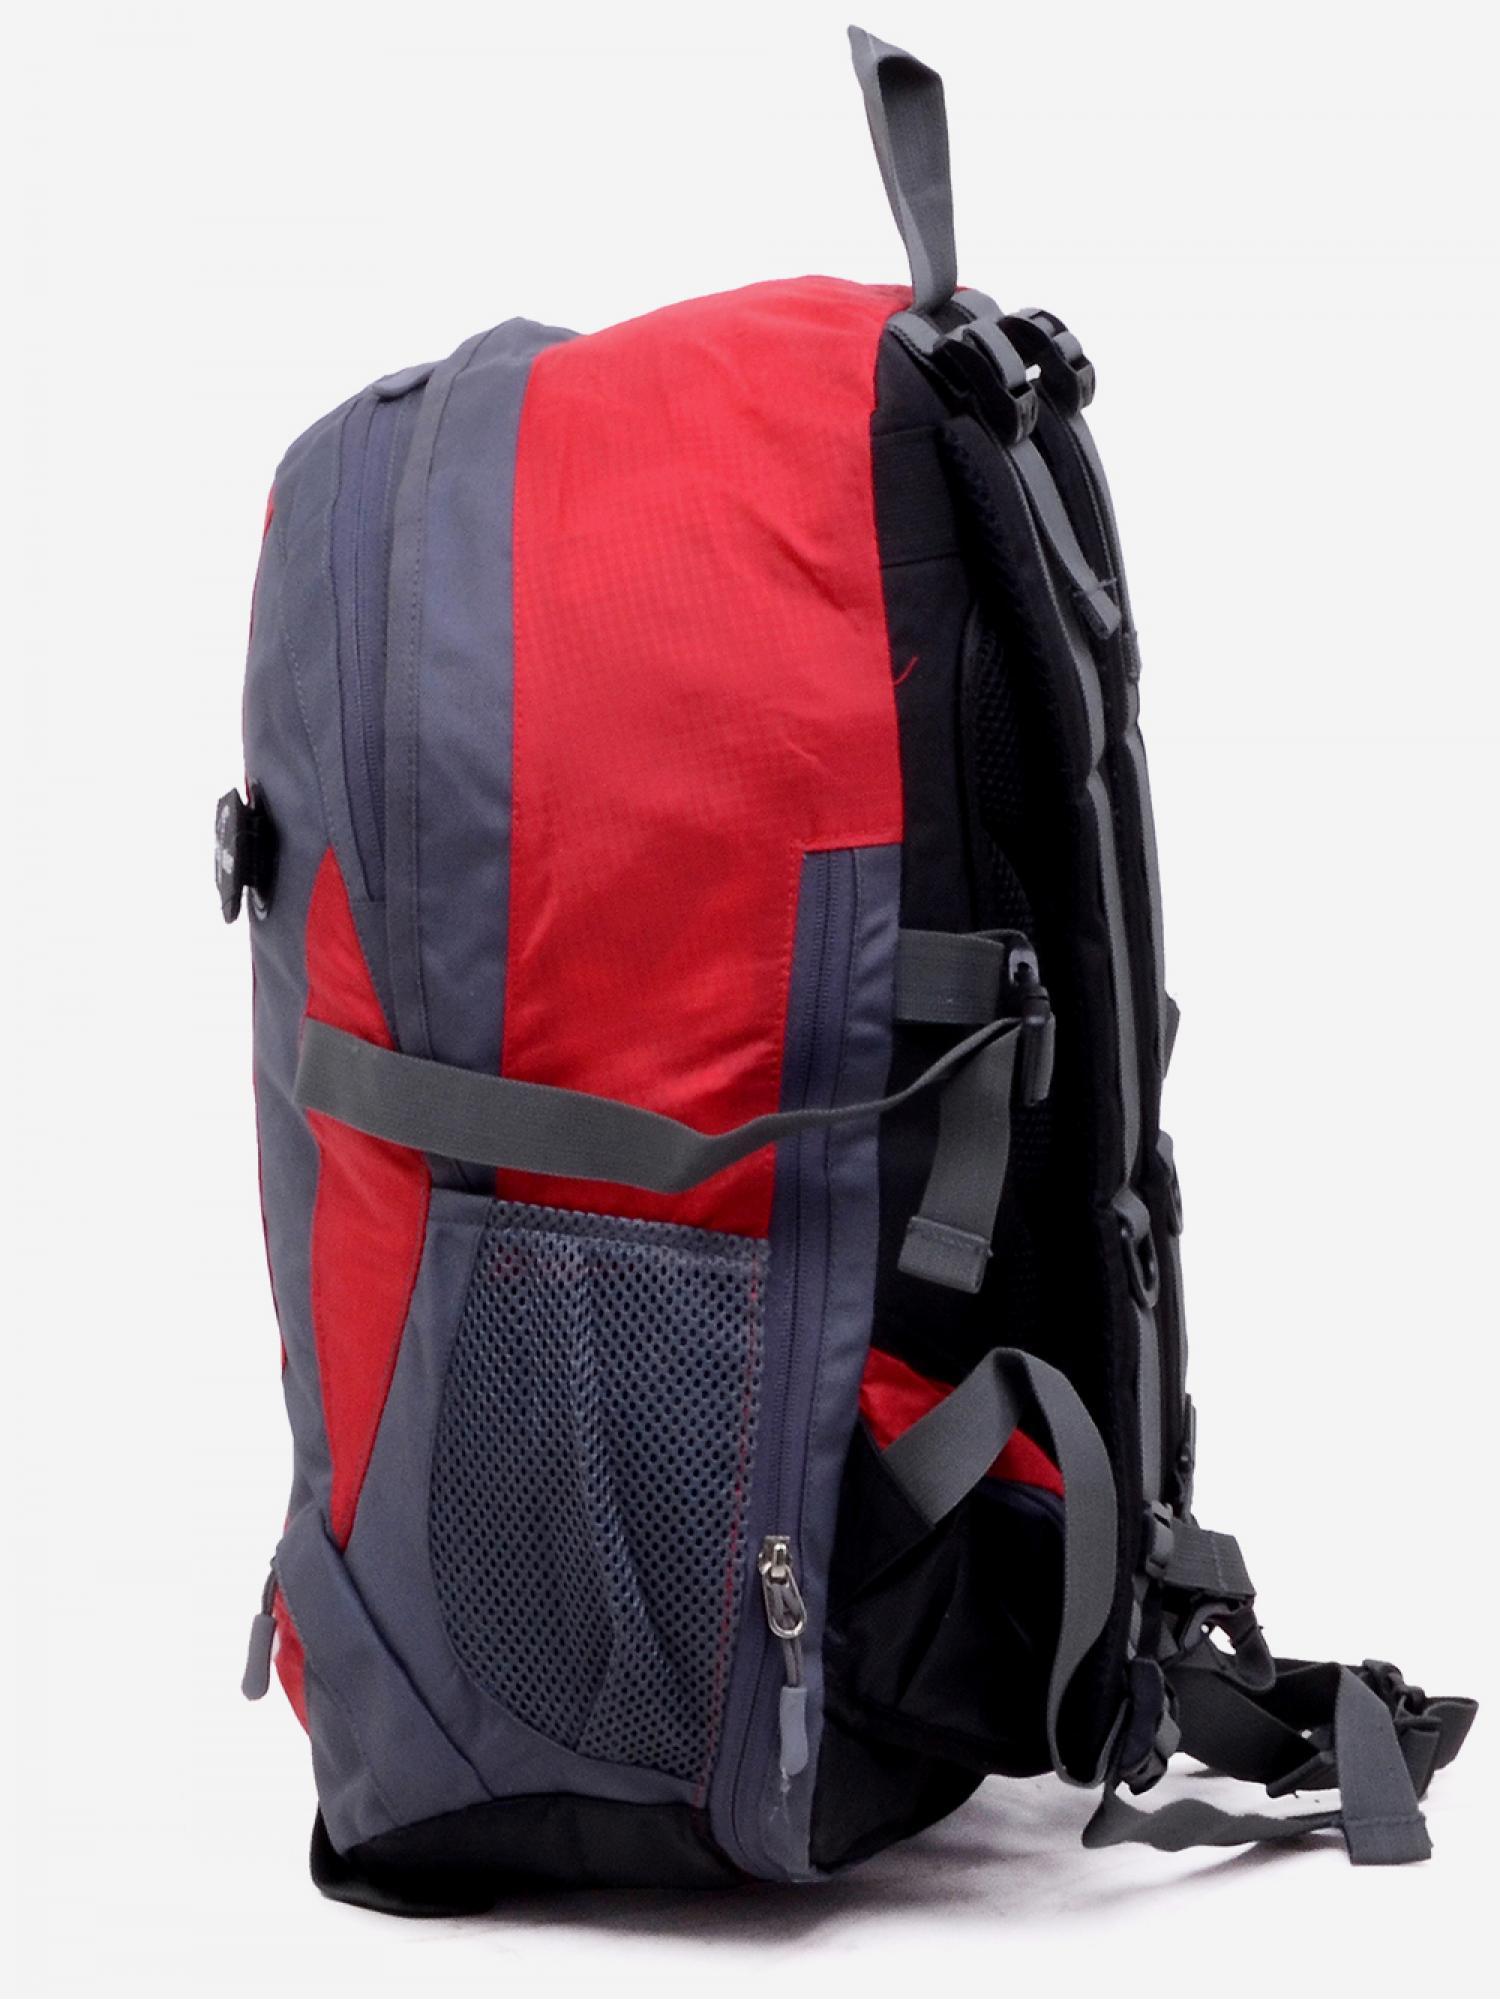 Рюкзак Camelot, limited series Premier 6012, Красный